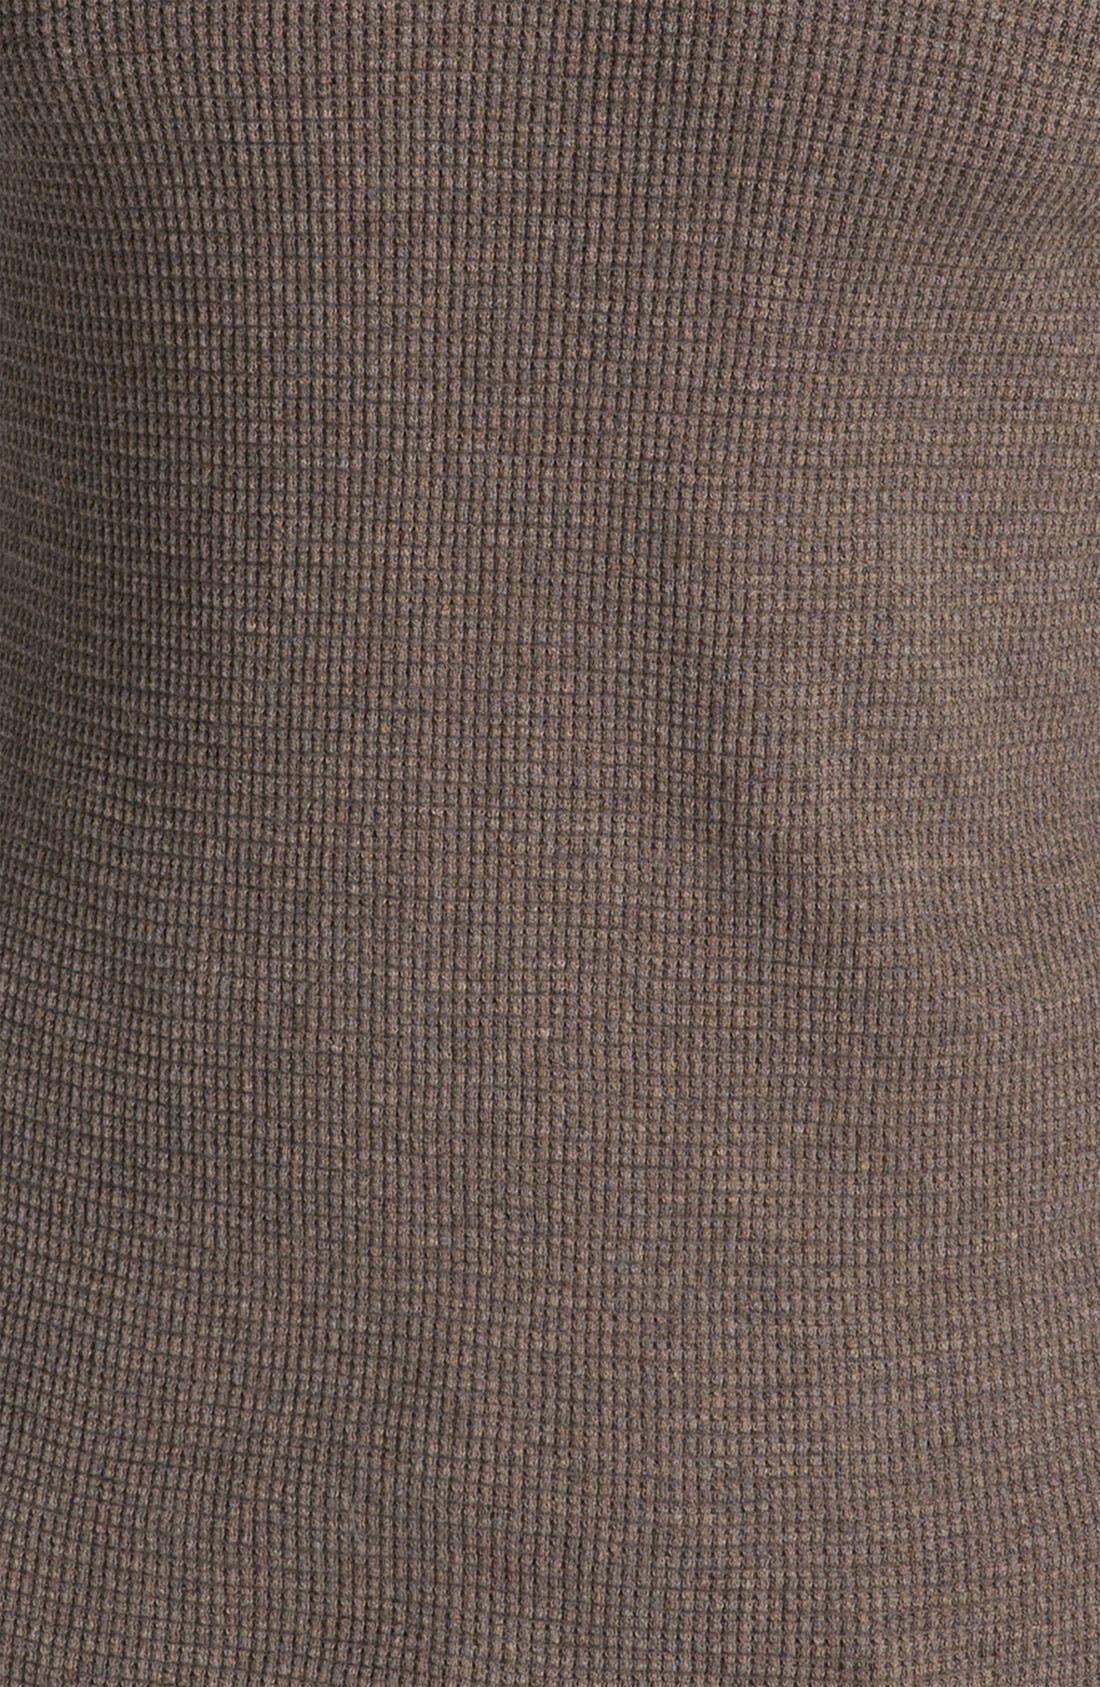 Alternate Image 3  - Vince Waffle Knit Sweater